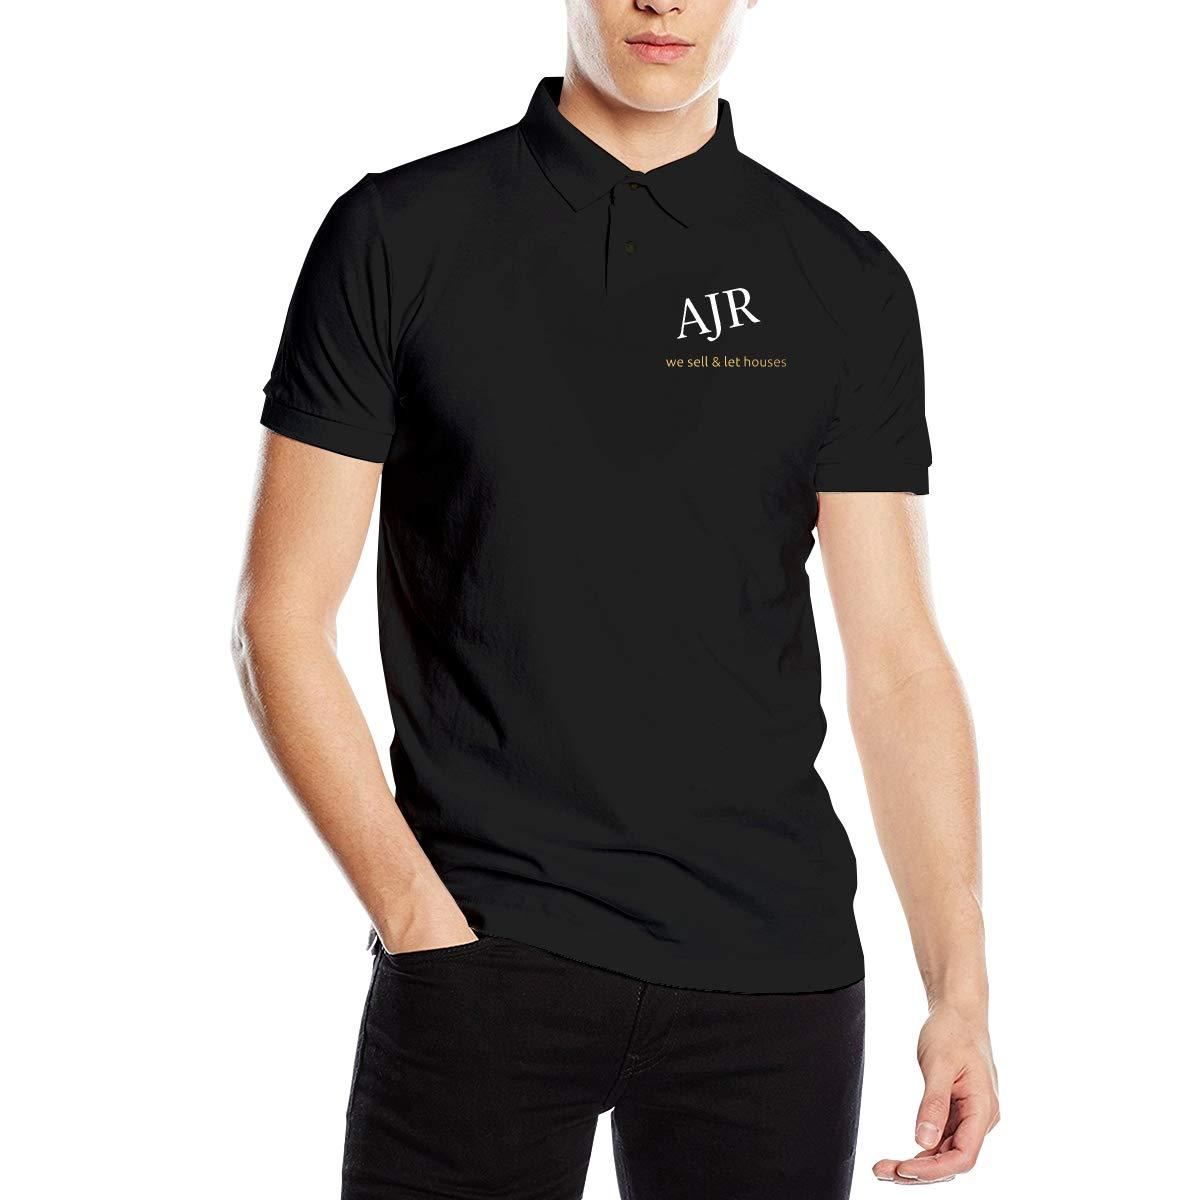 Cjlrqone Robert A Gonzalez Beartooth Mens Personality Polo Shirts M Black